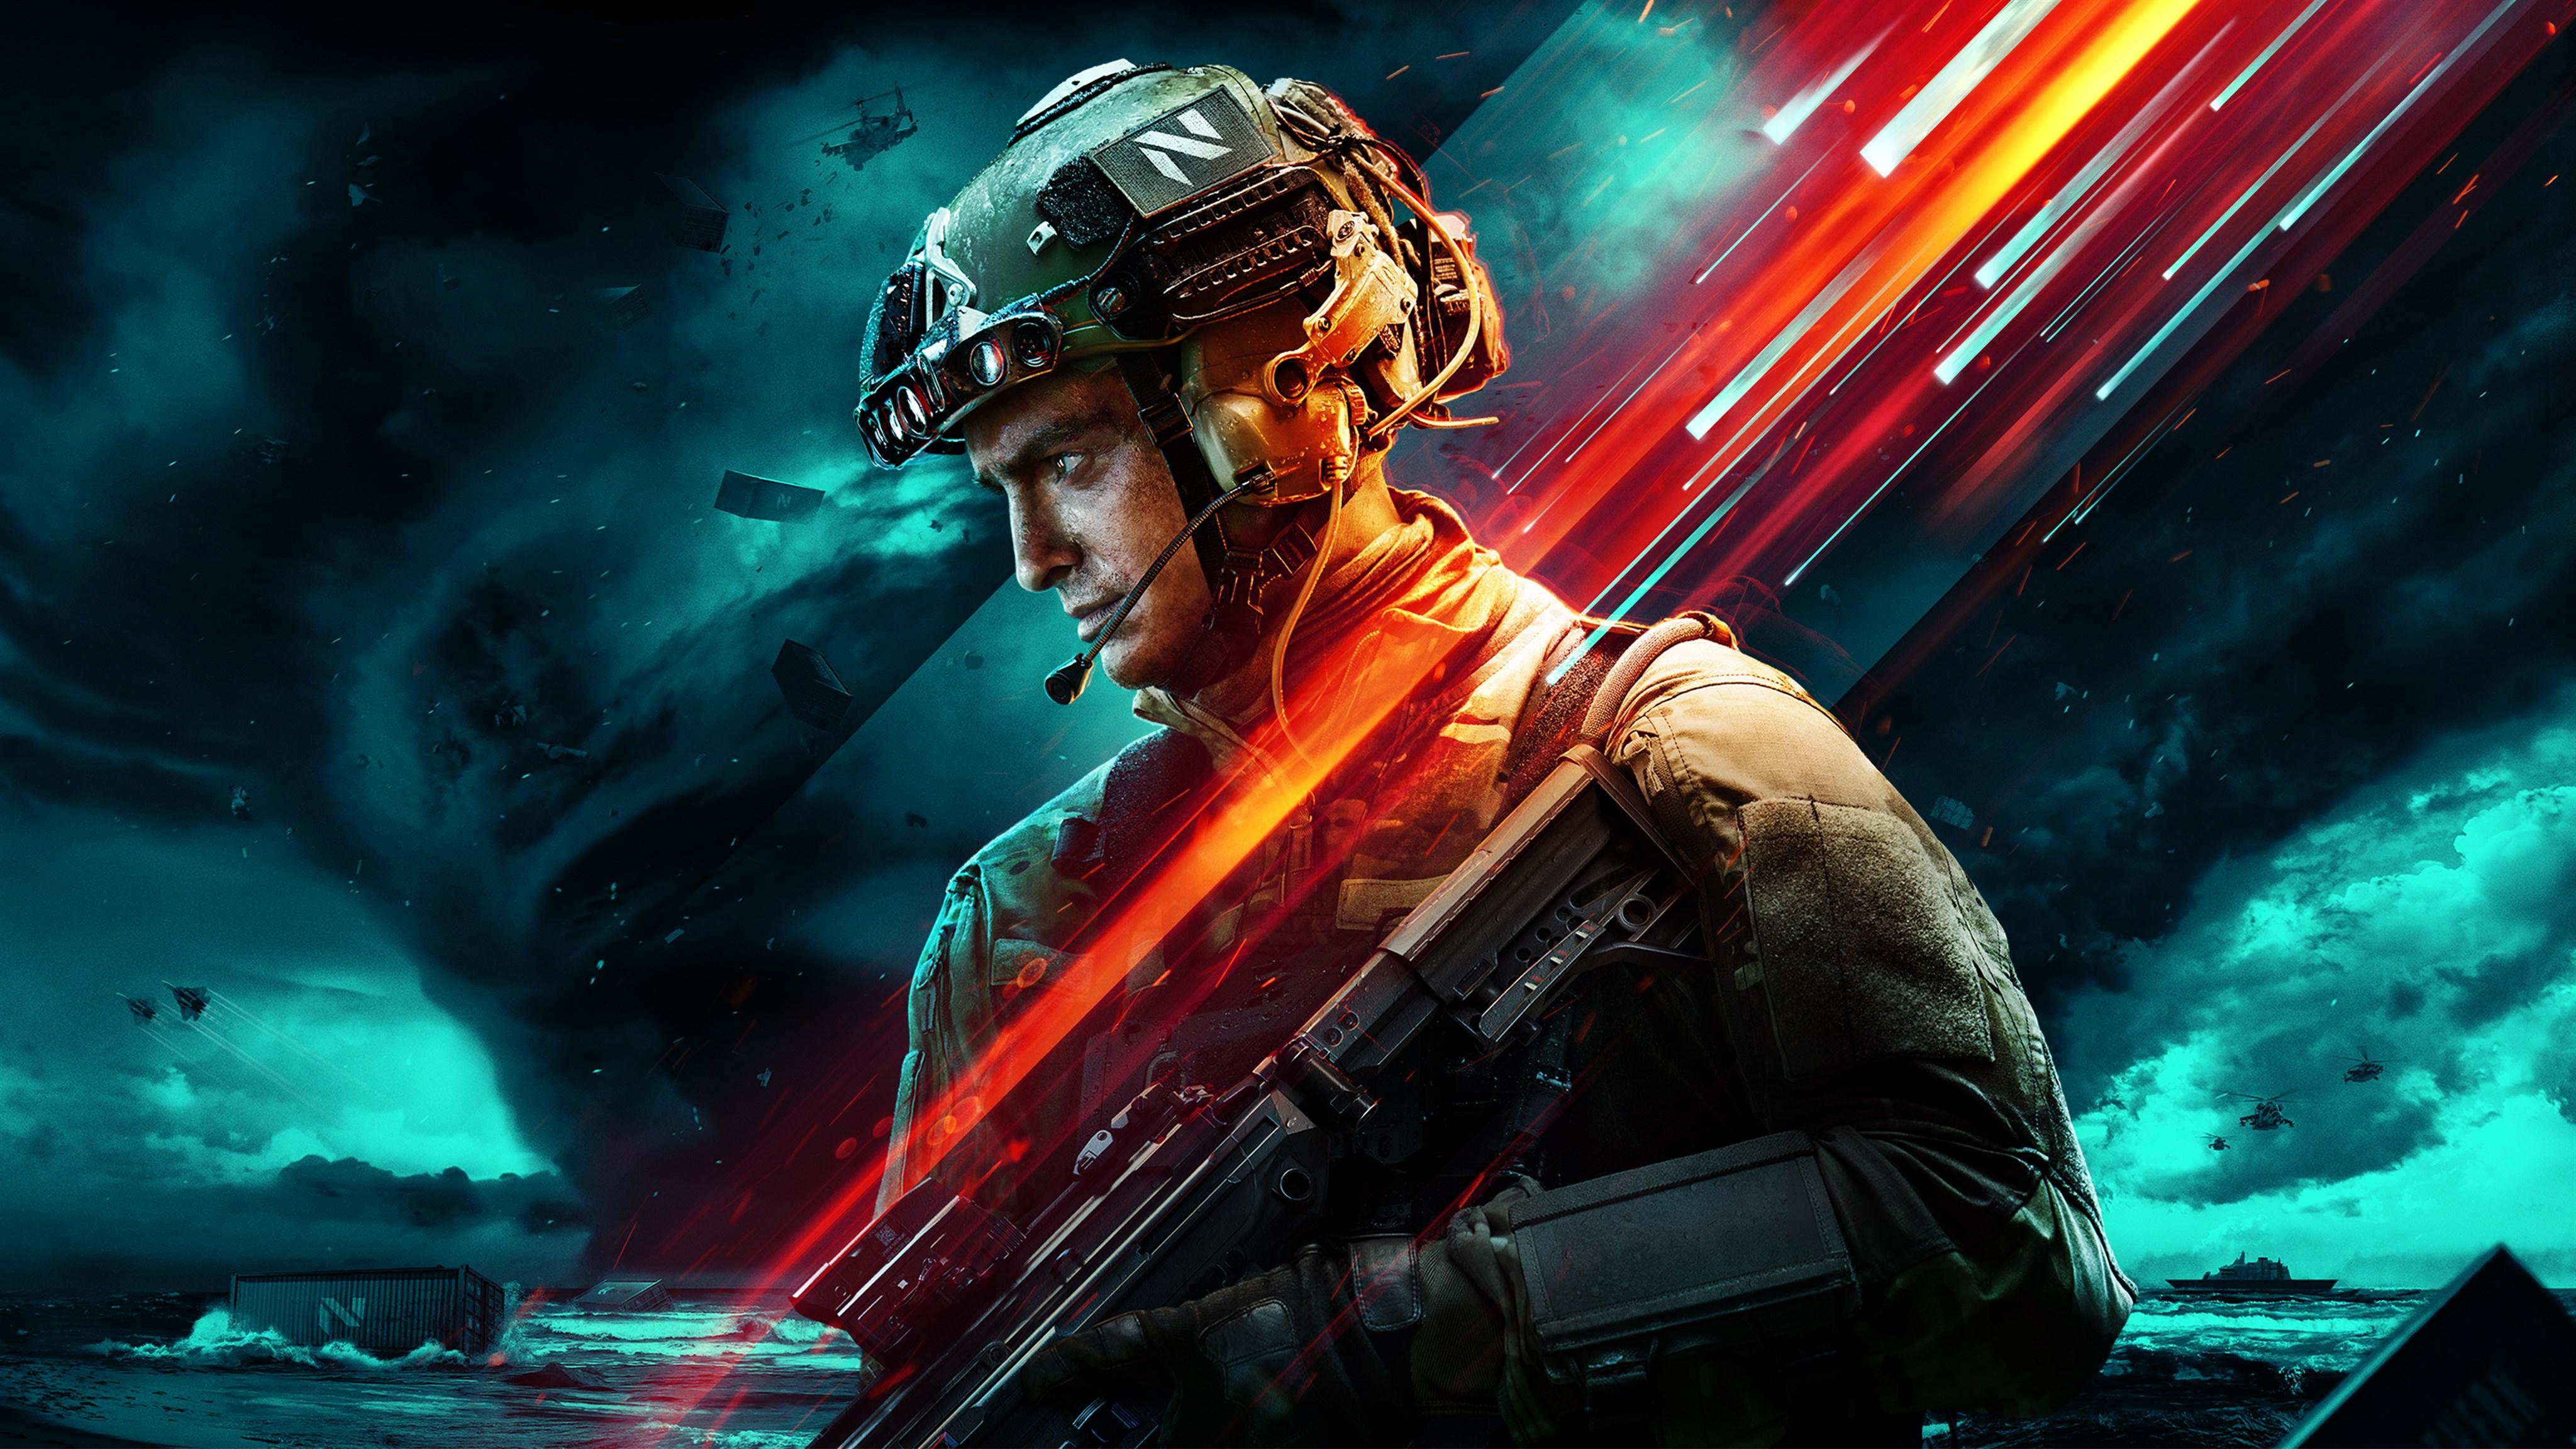 Battlefield 2042 4k Ultra HD Wallpaper Background Image 4096x2304 3840x2160